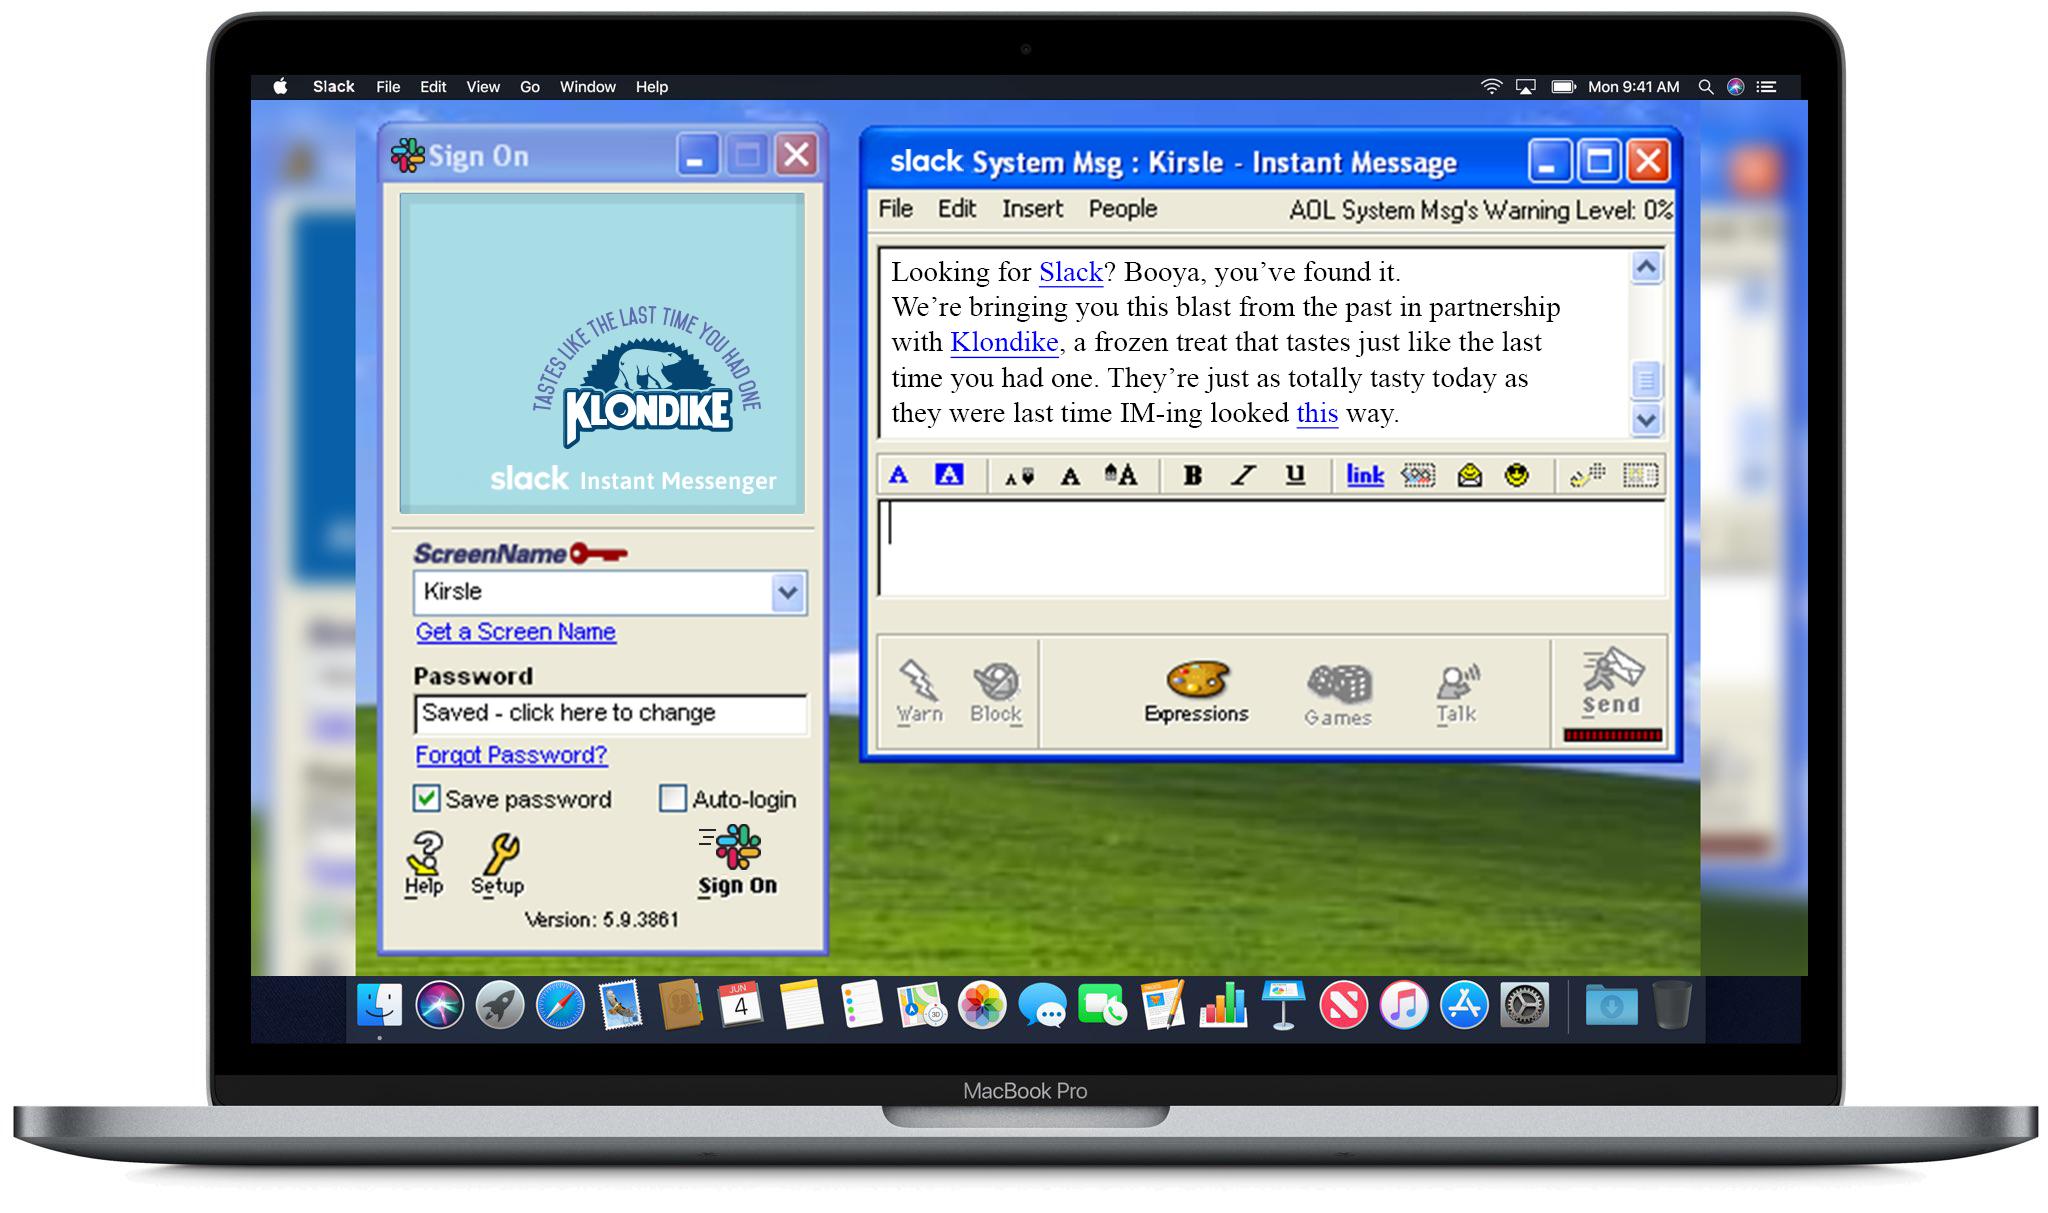 Klondike slack mockup laptop 1.1 (1).png